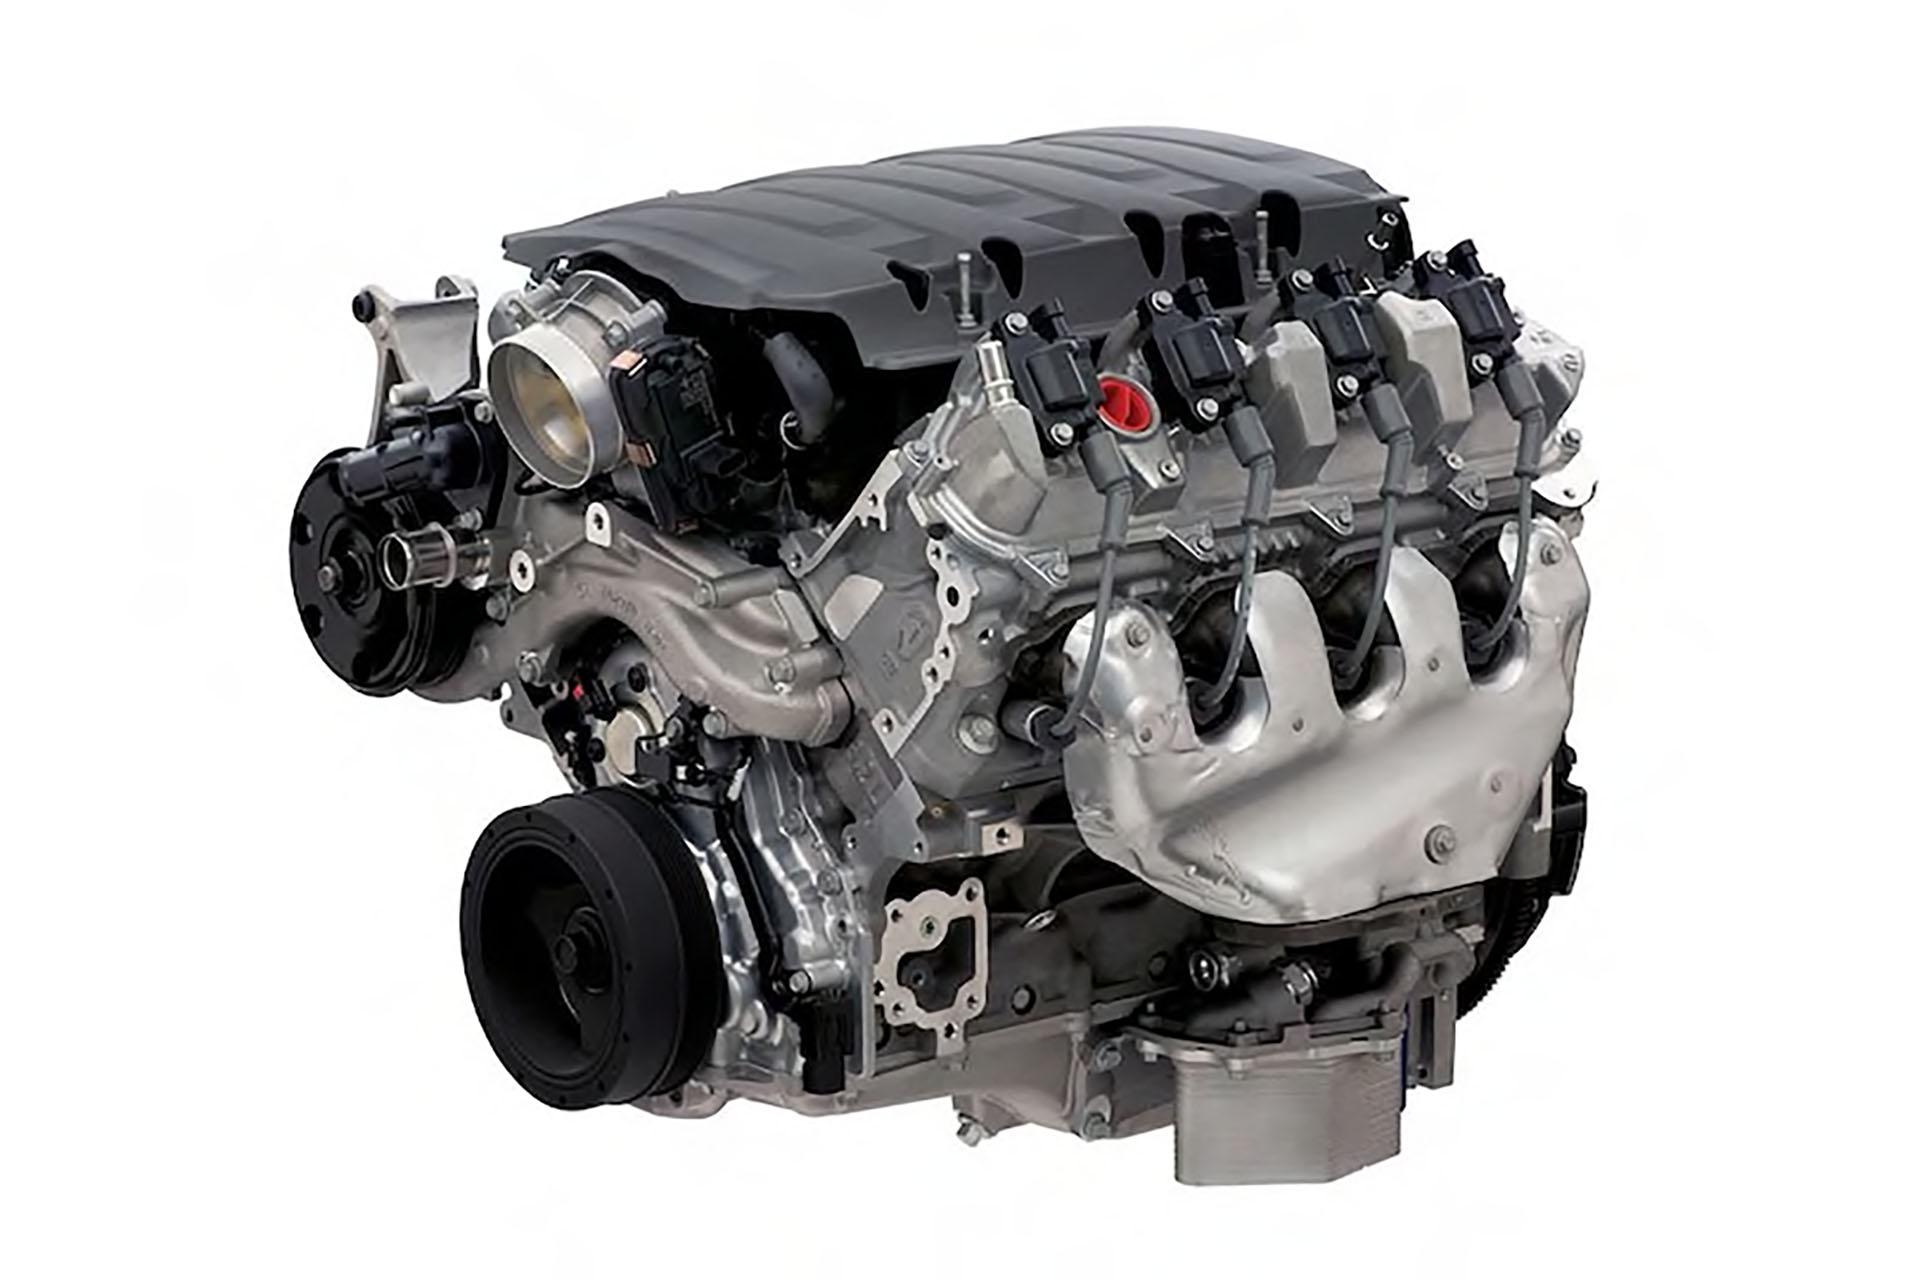 LT1 Chevy small block V8 Engine